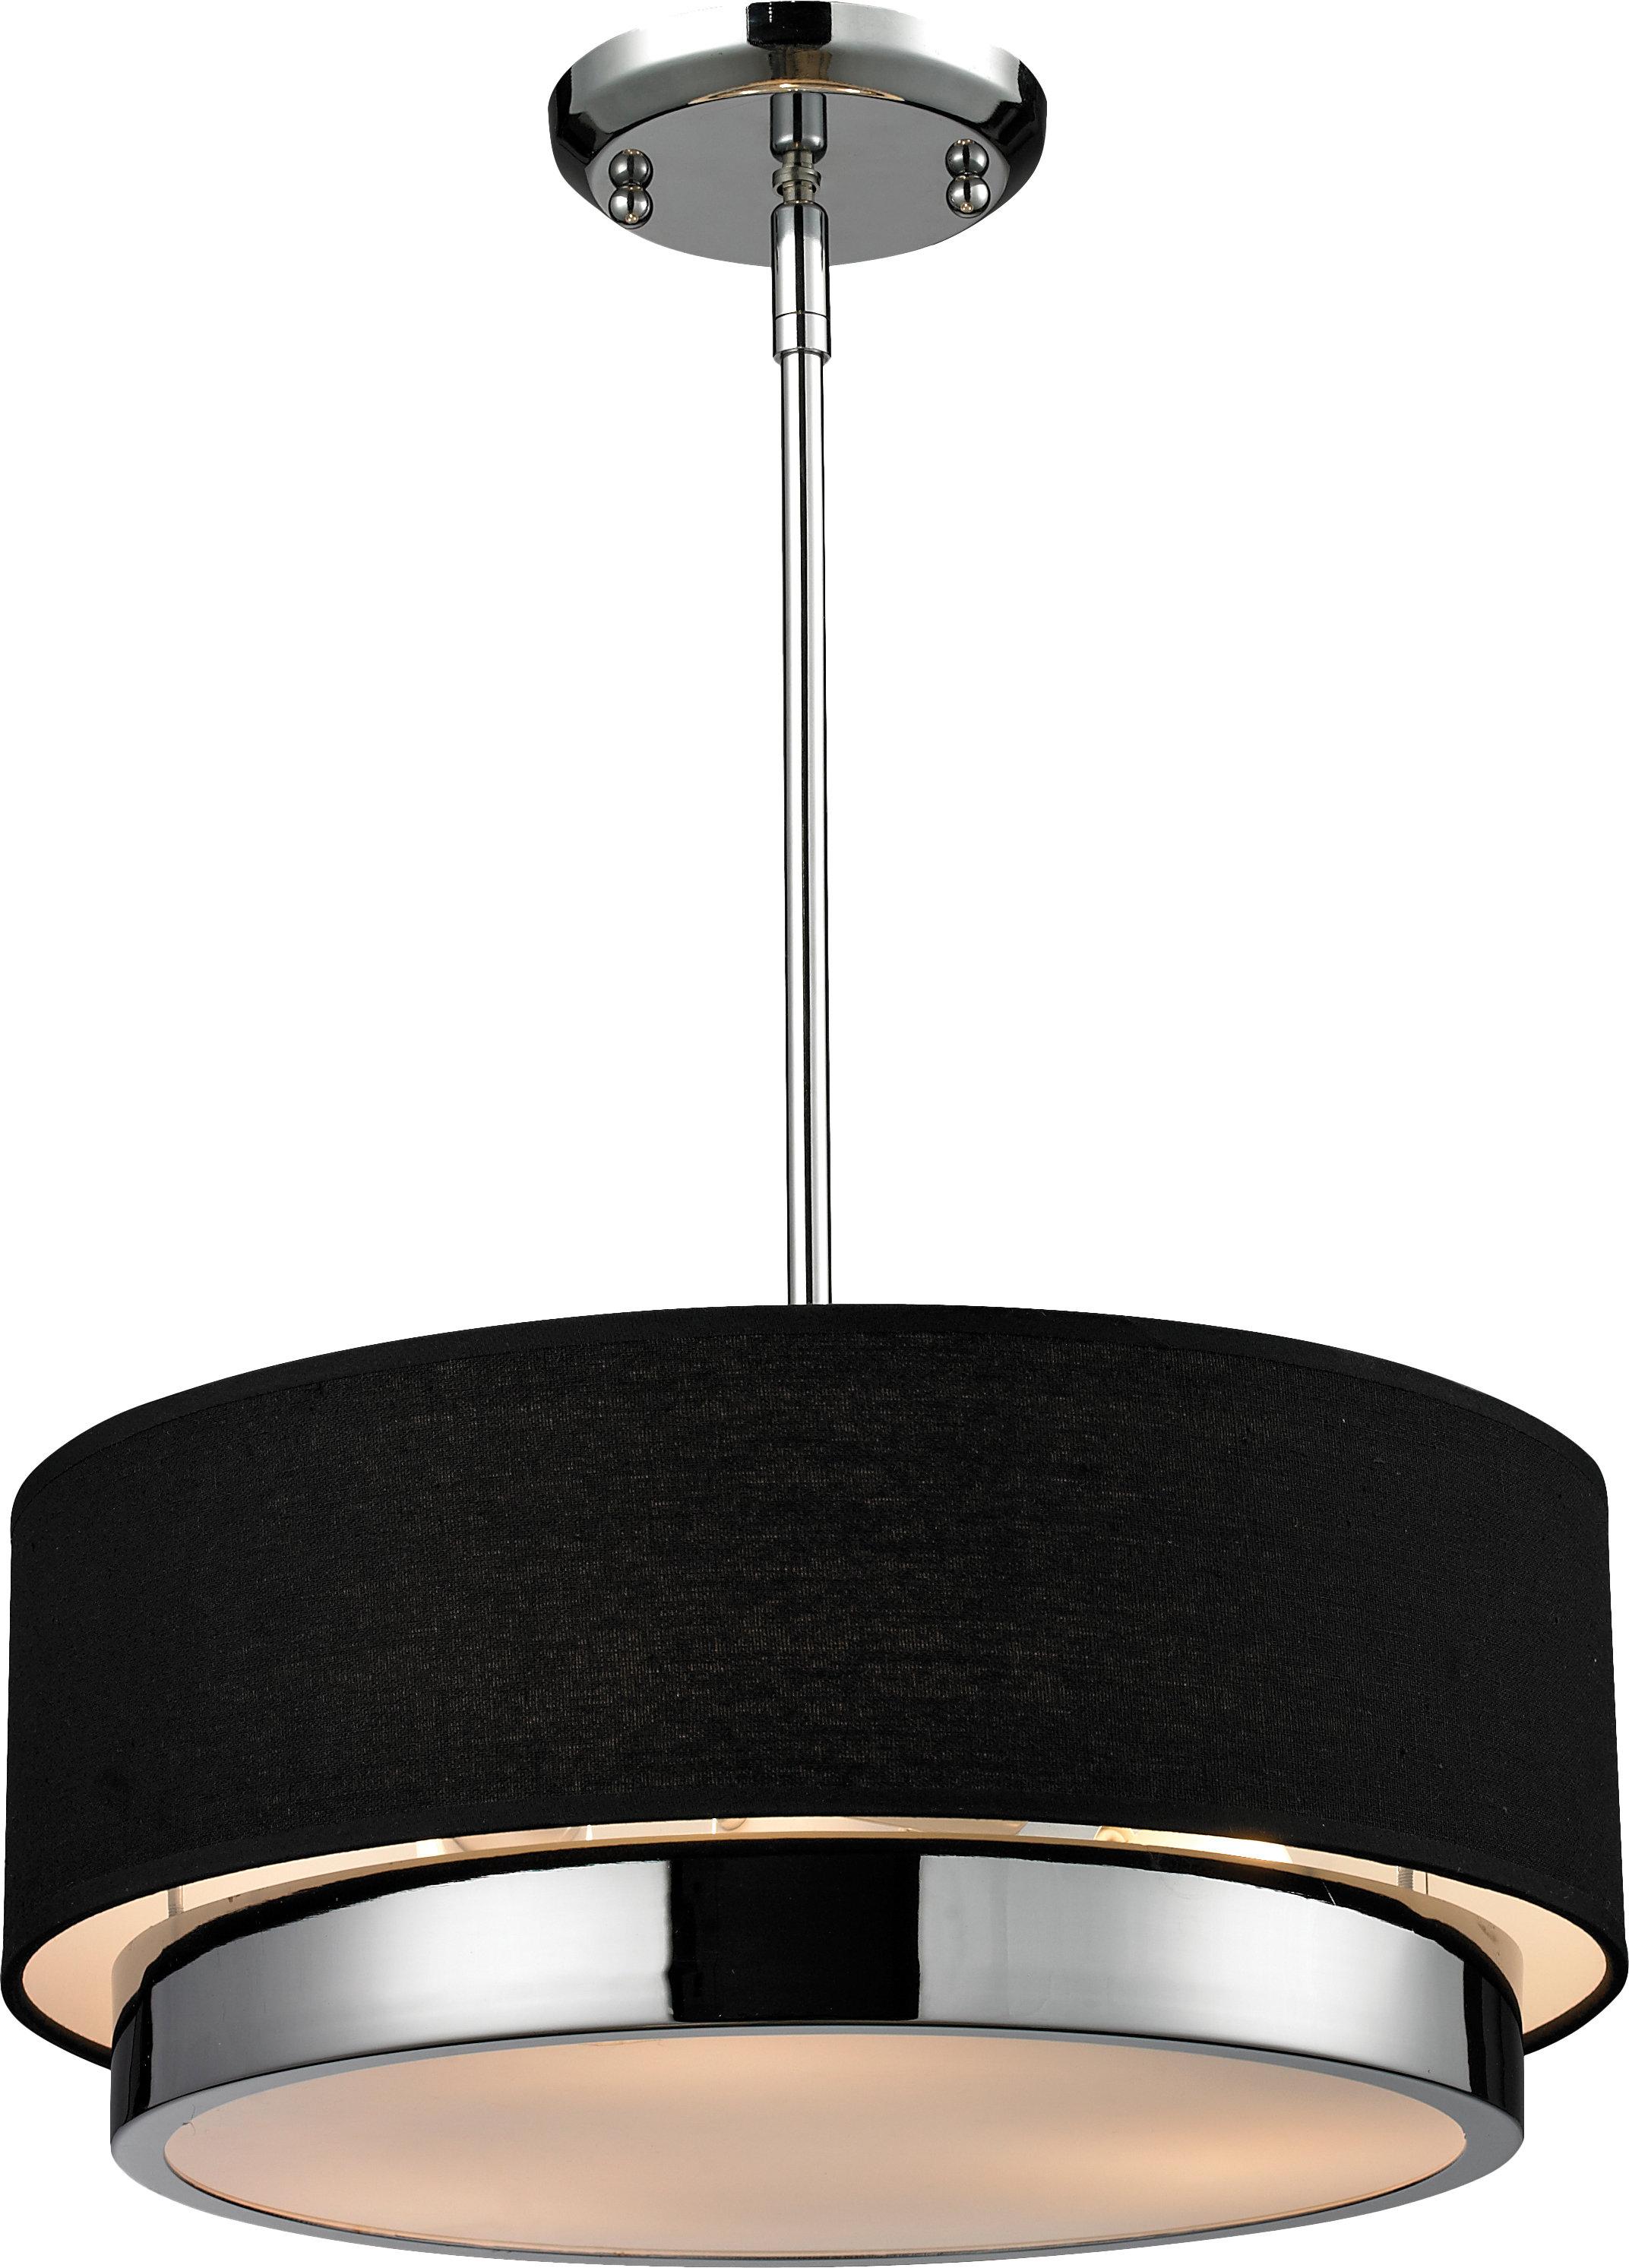 Alvarez 3-Light Drum Chandelier with Alverez 4-Light Drum Chandeliers (Image 2 of 30)